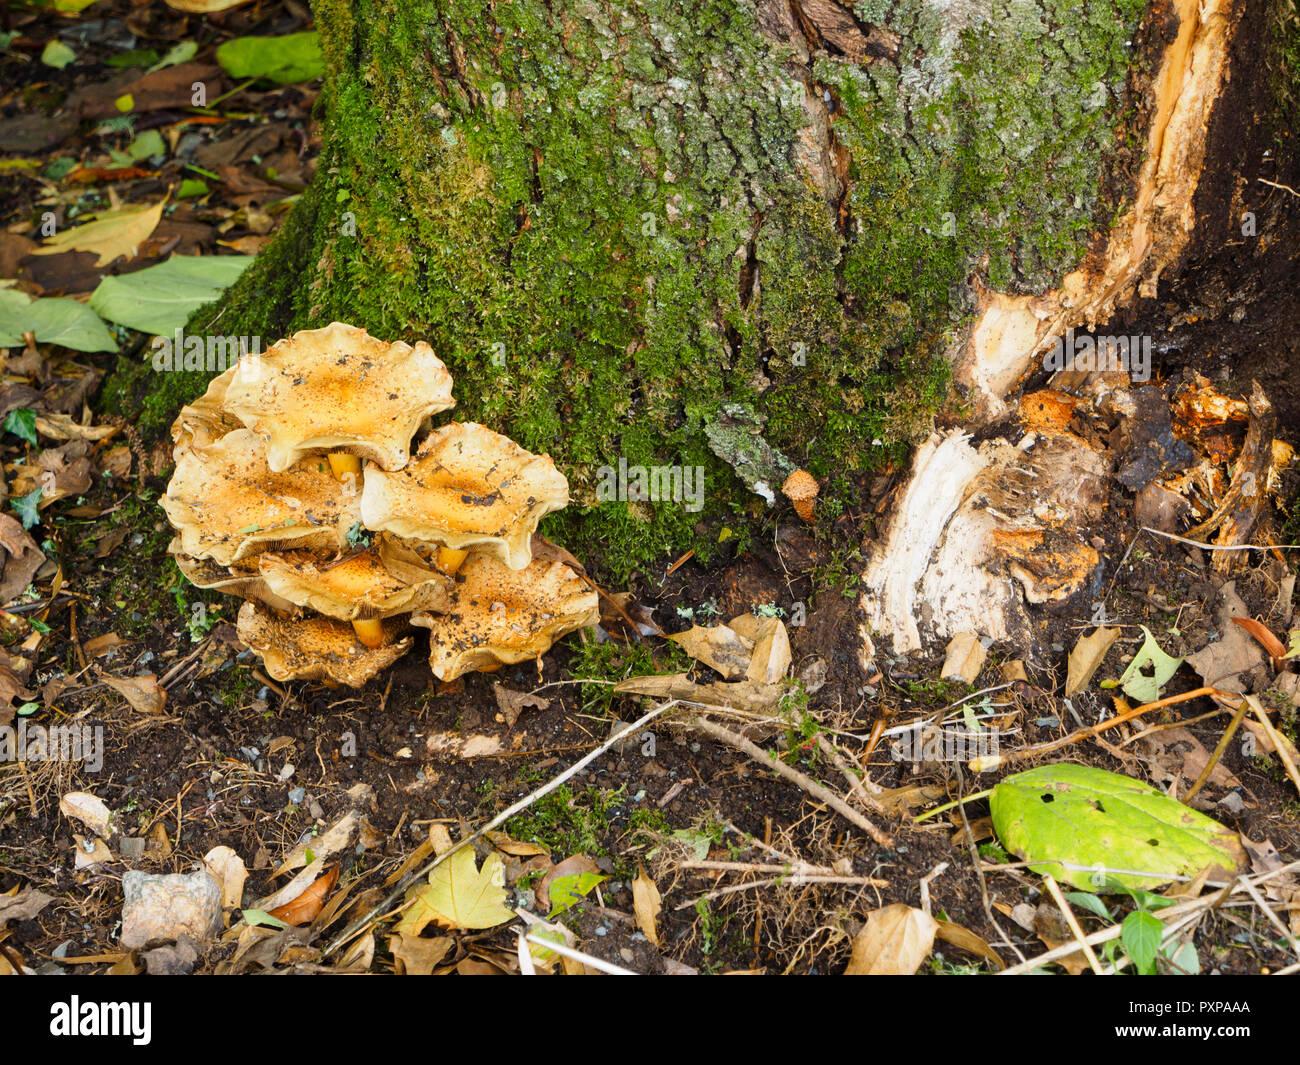 Honey fungus, Armillarea mellea, showing at the base of a diseased Catalpa x erubescens 'Purpurea'.  The tree has split after autumn gales - Stock Image